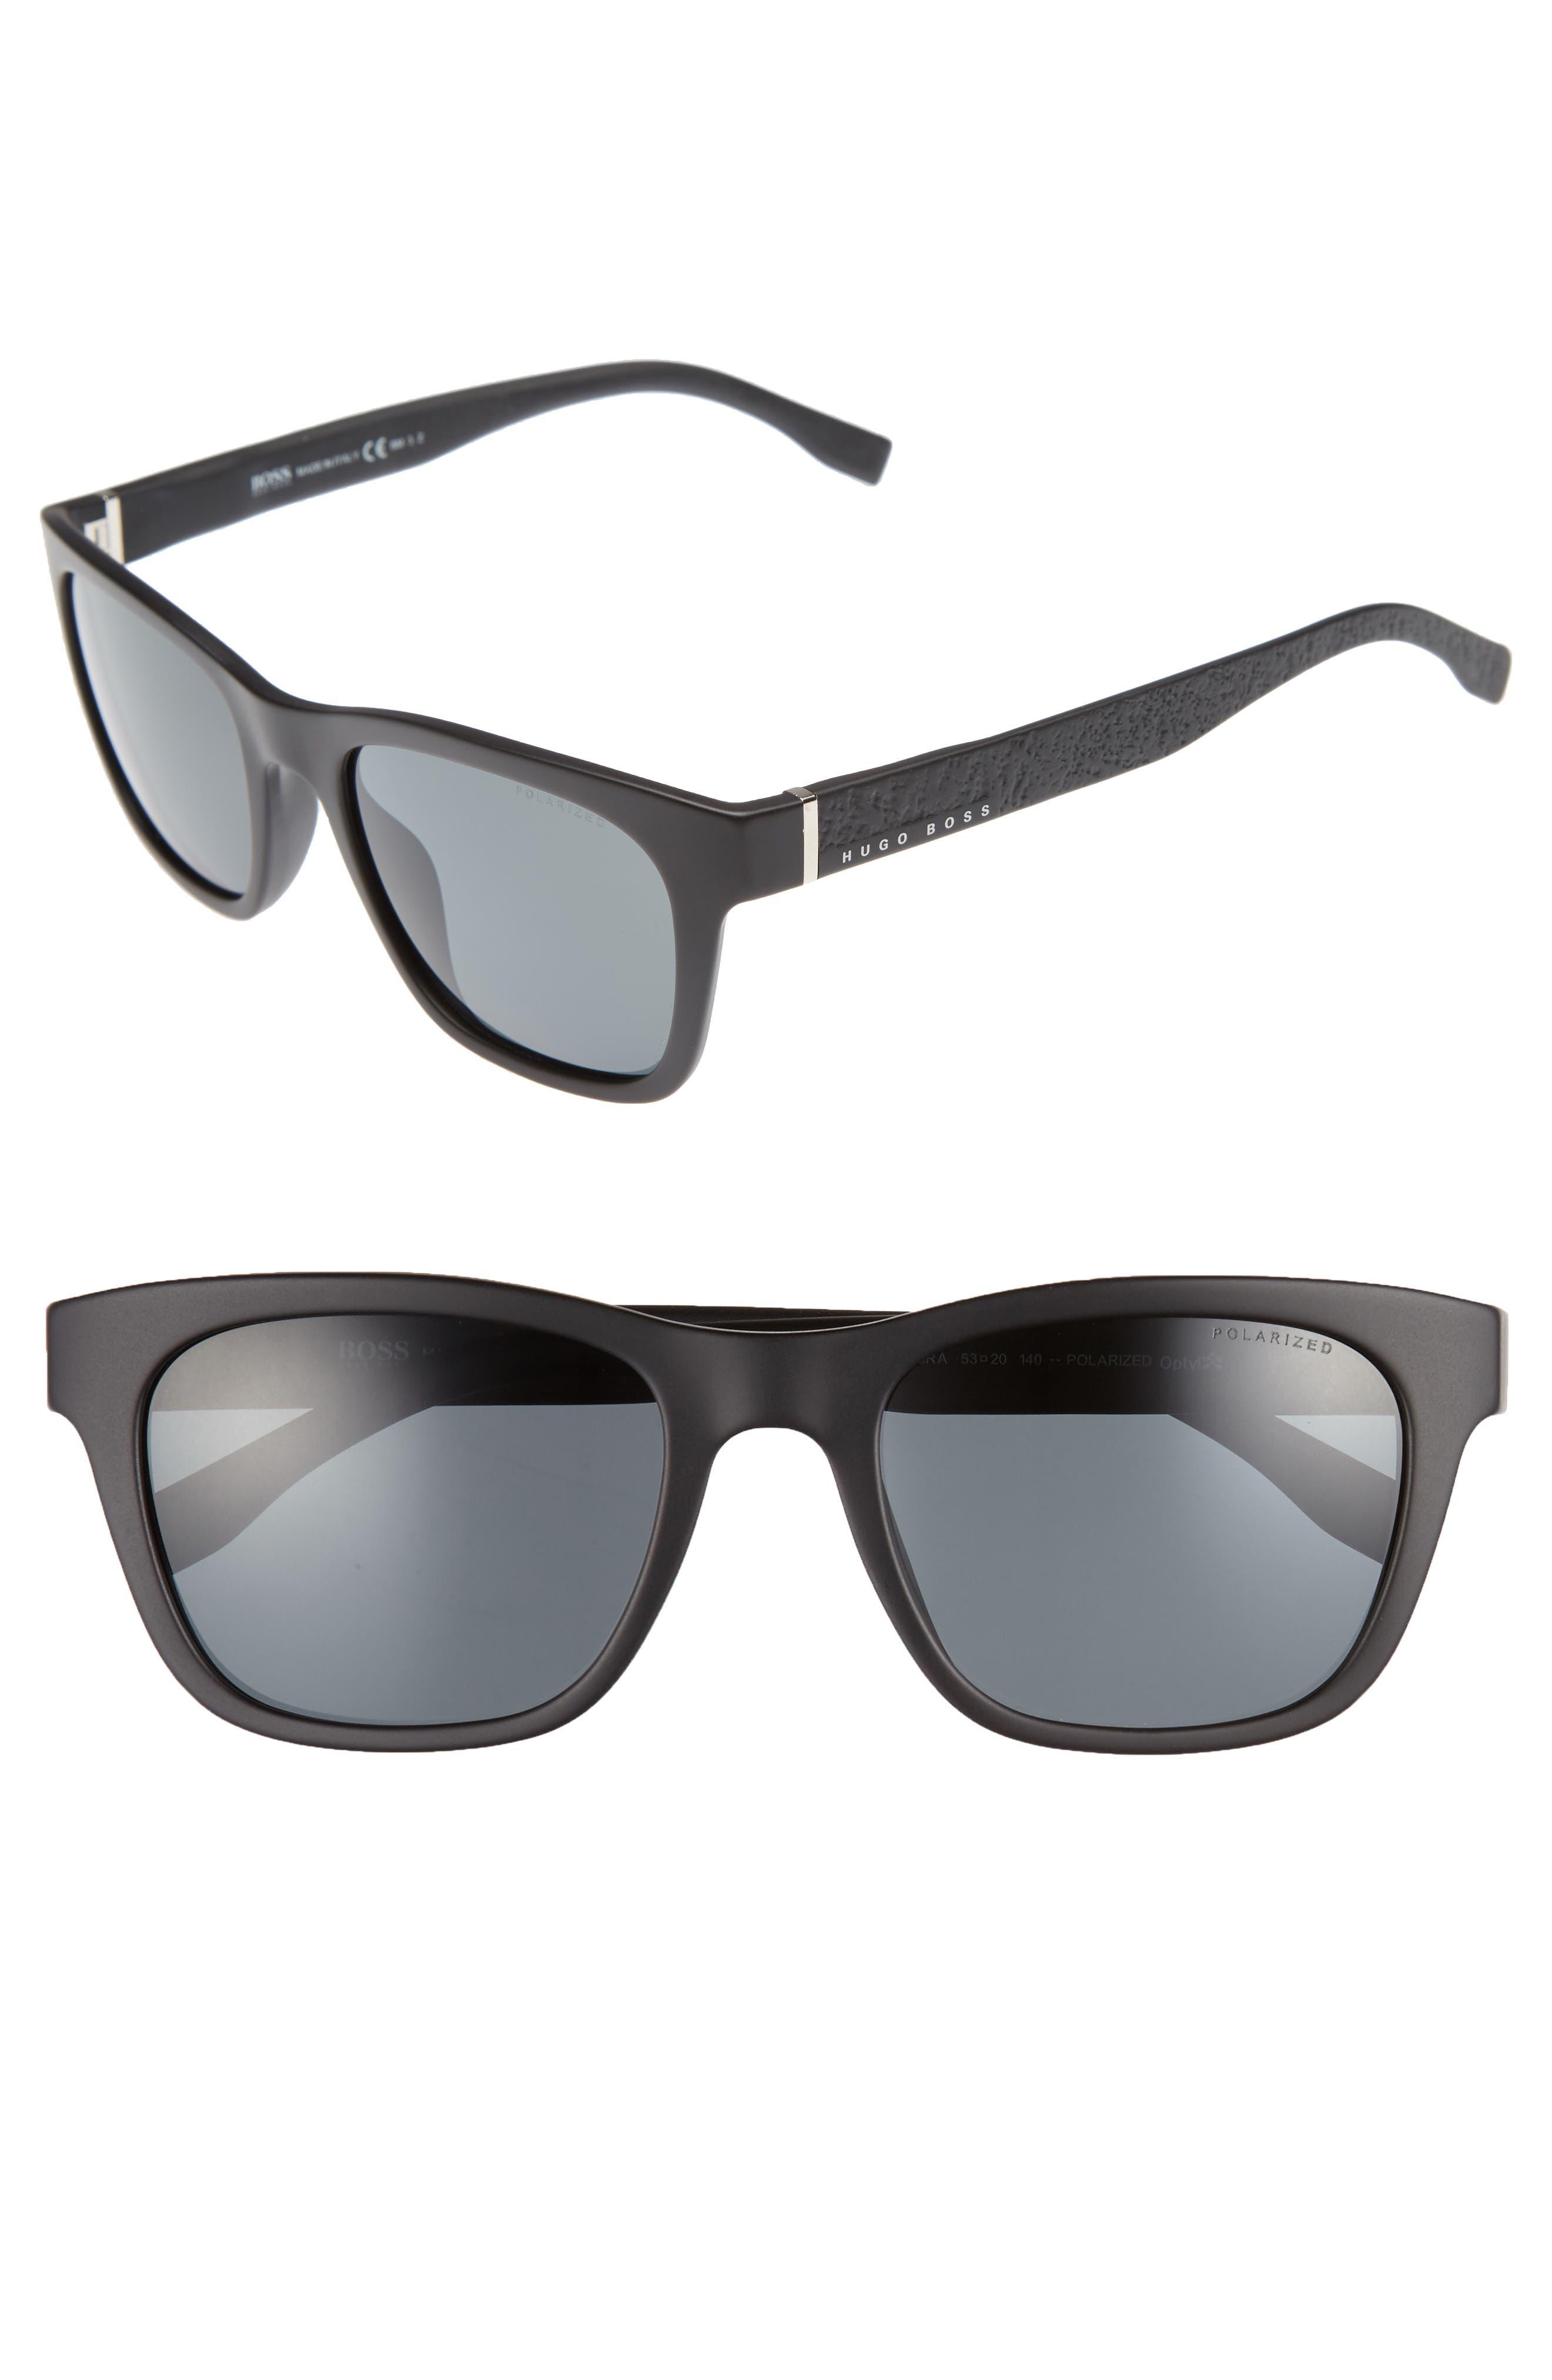 53mm Polarized Sunglasses,                         Main,                         color, Matte Black/ Grey